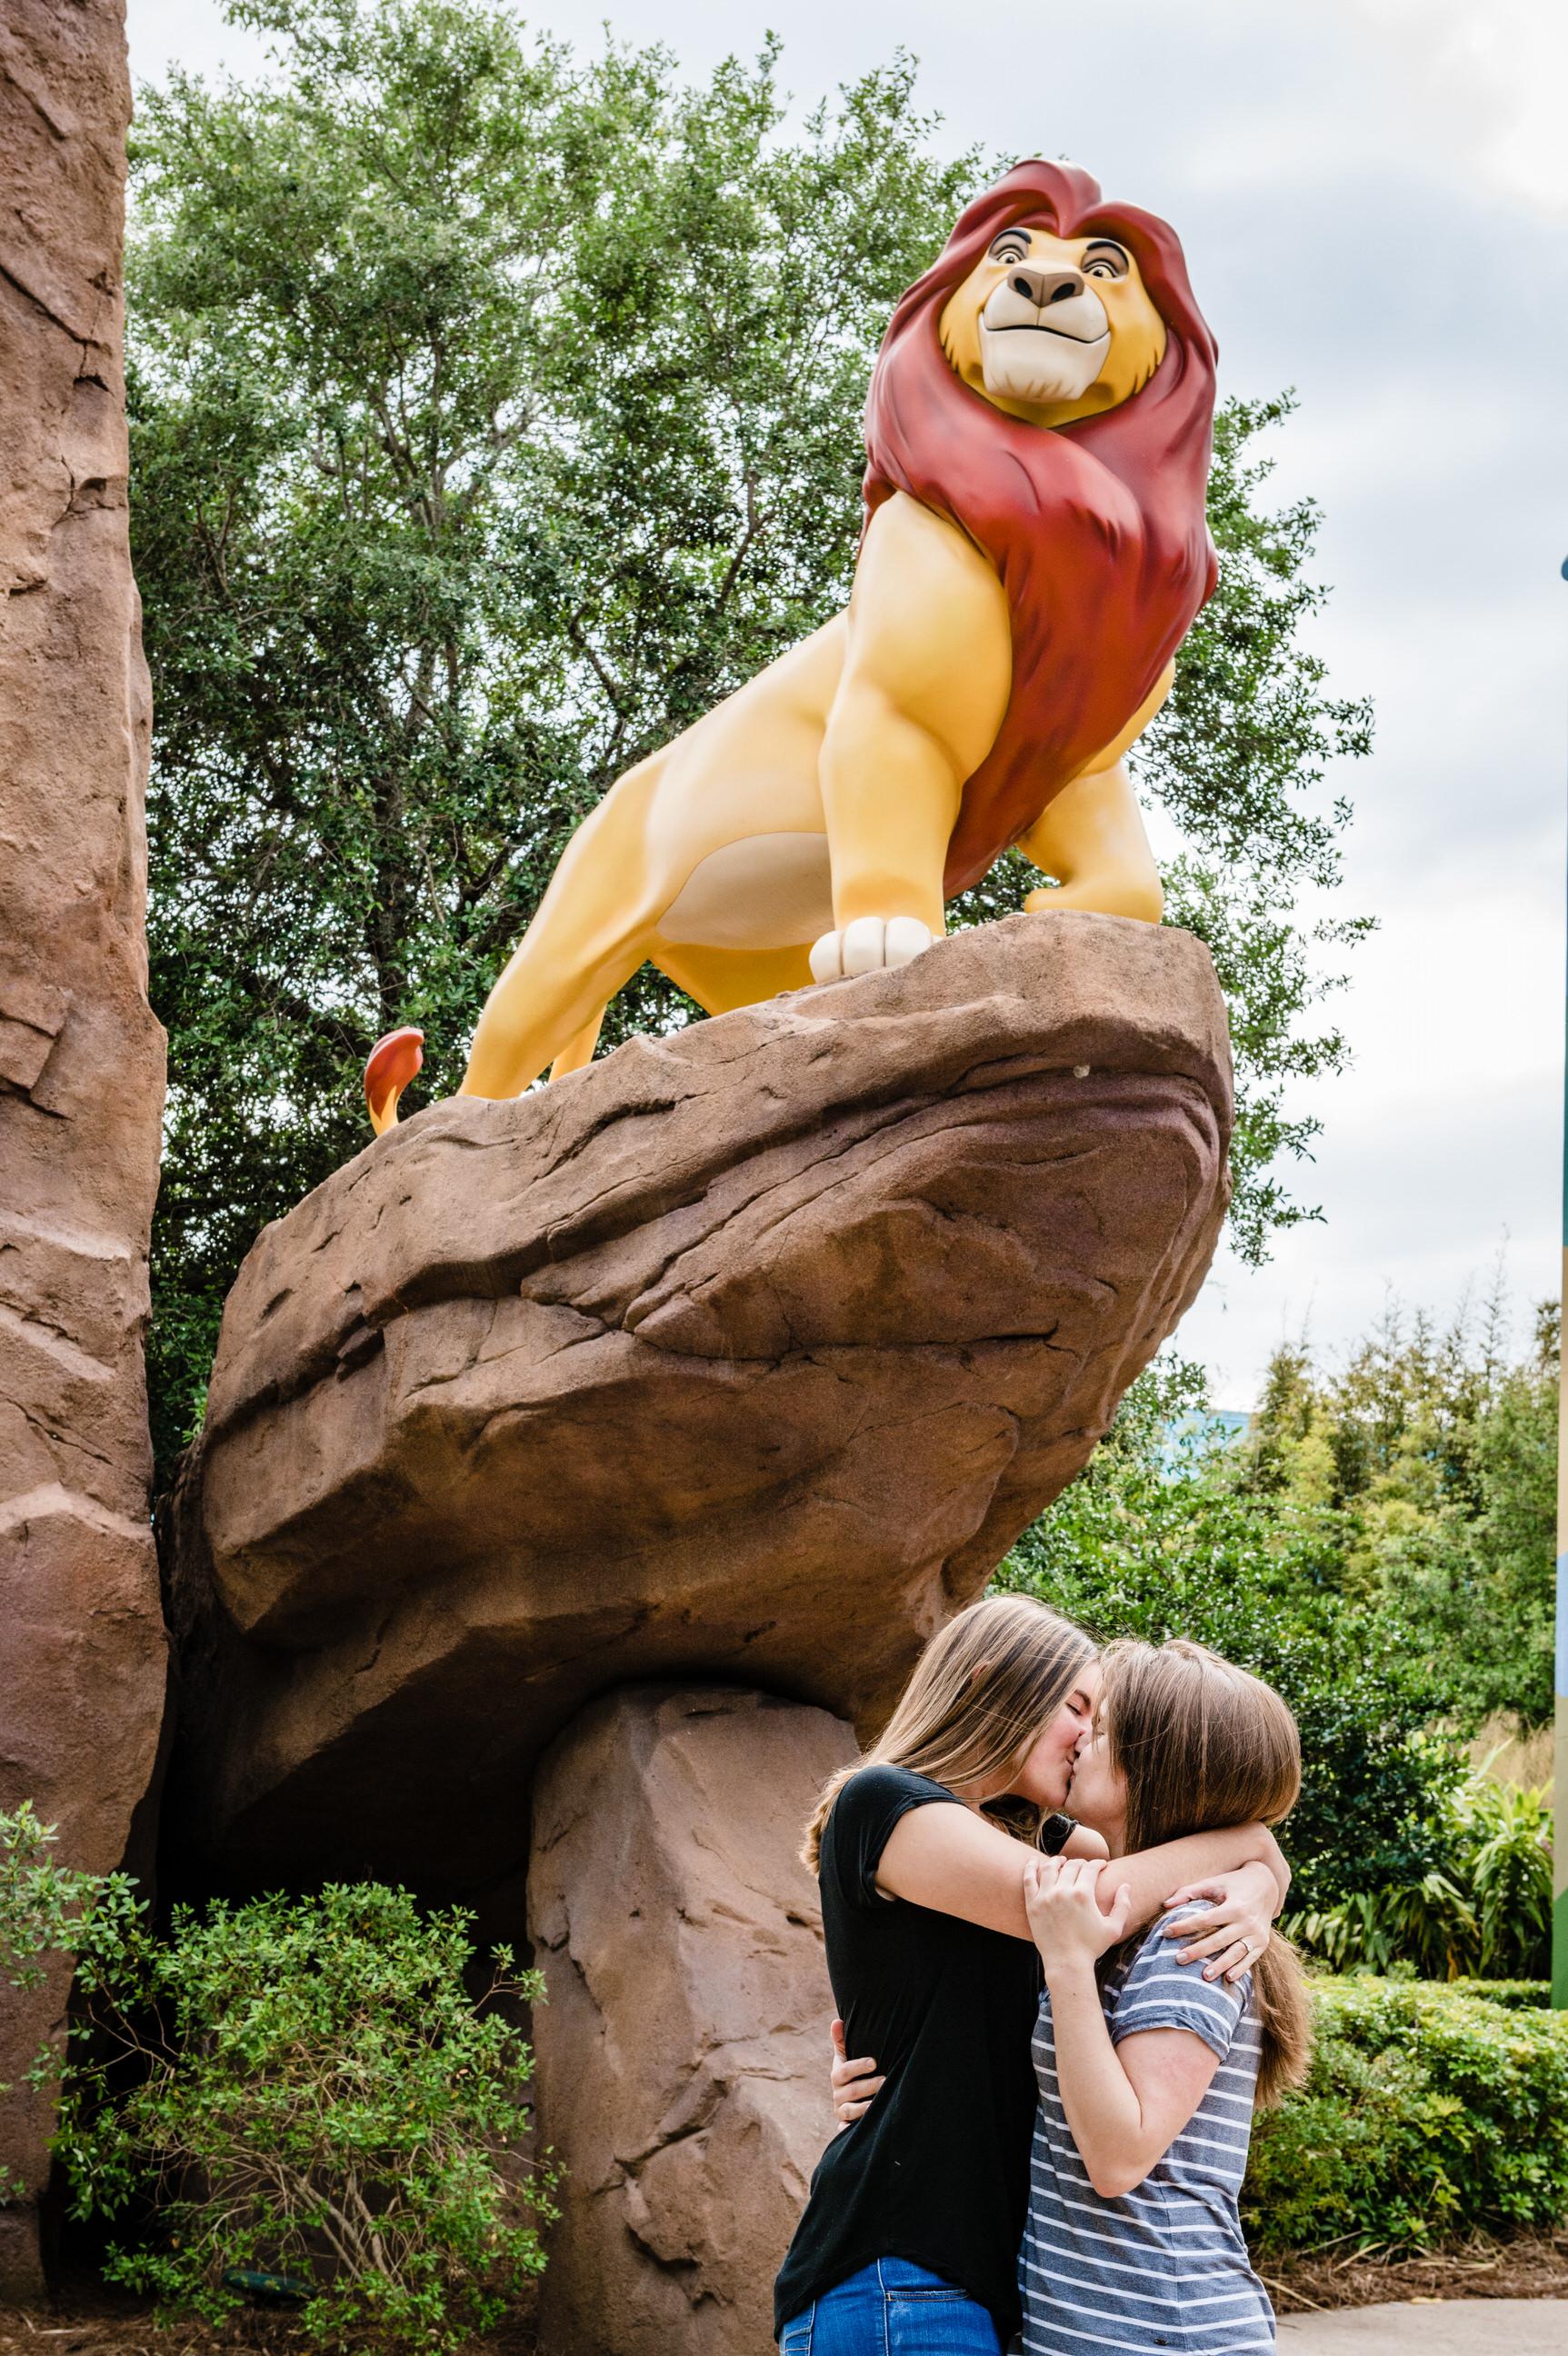 DisneyAnimation-Amanda&Shelby-5243.jpg